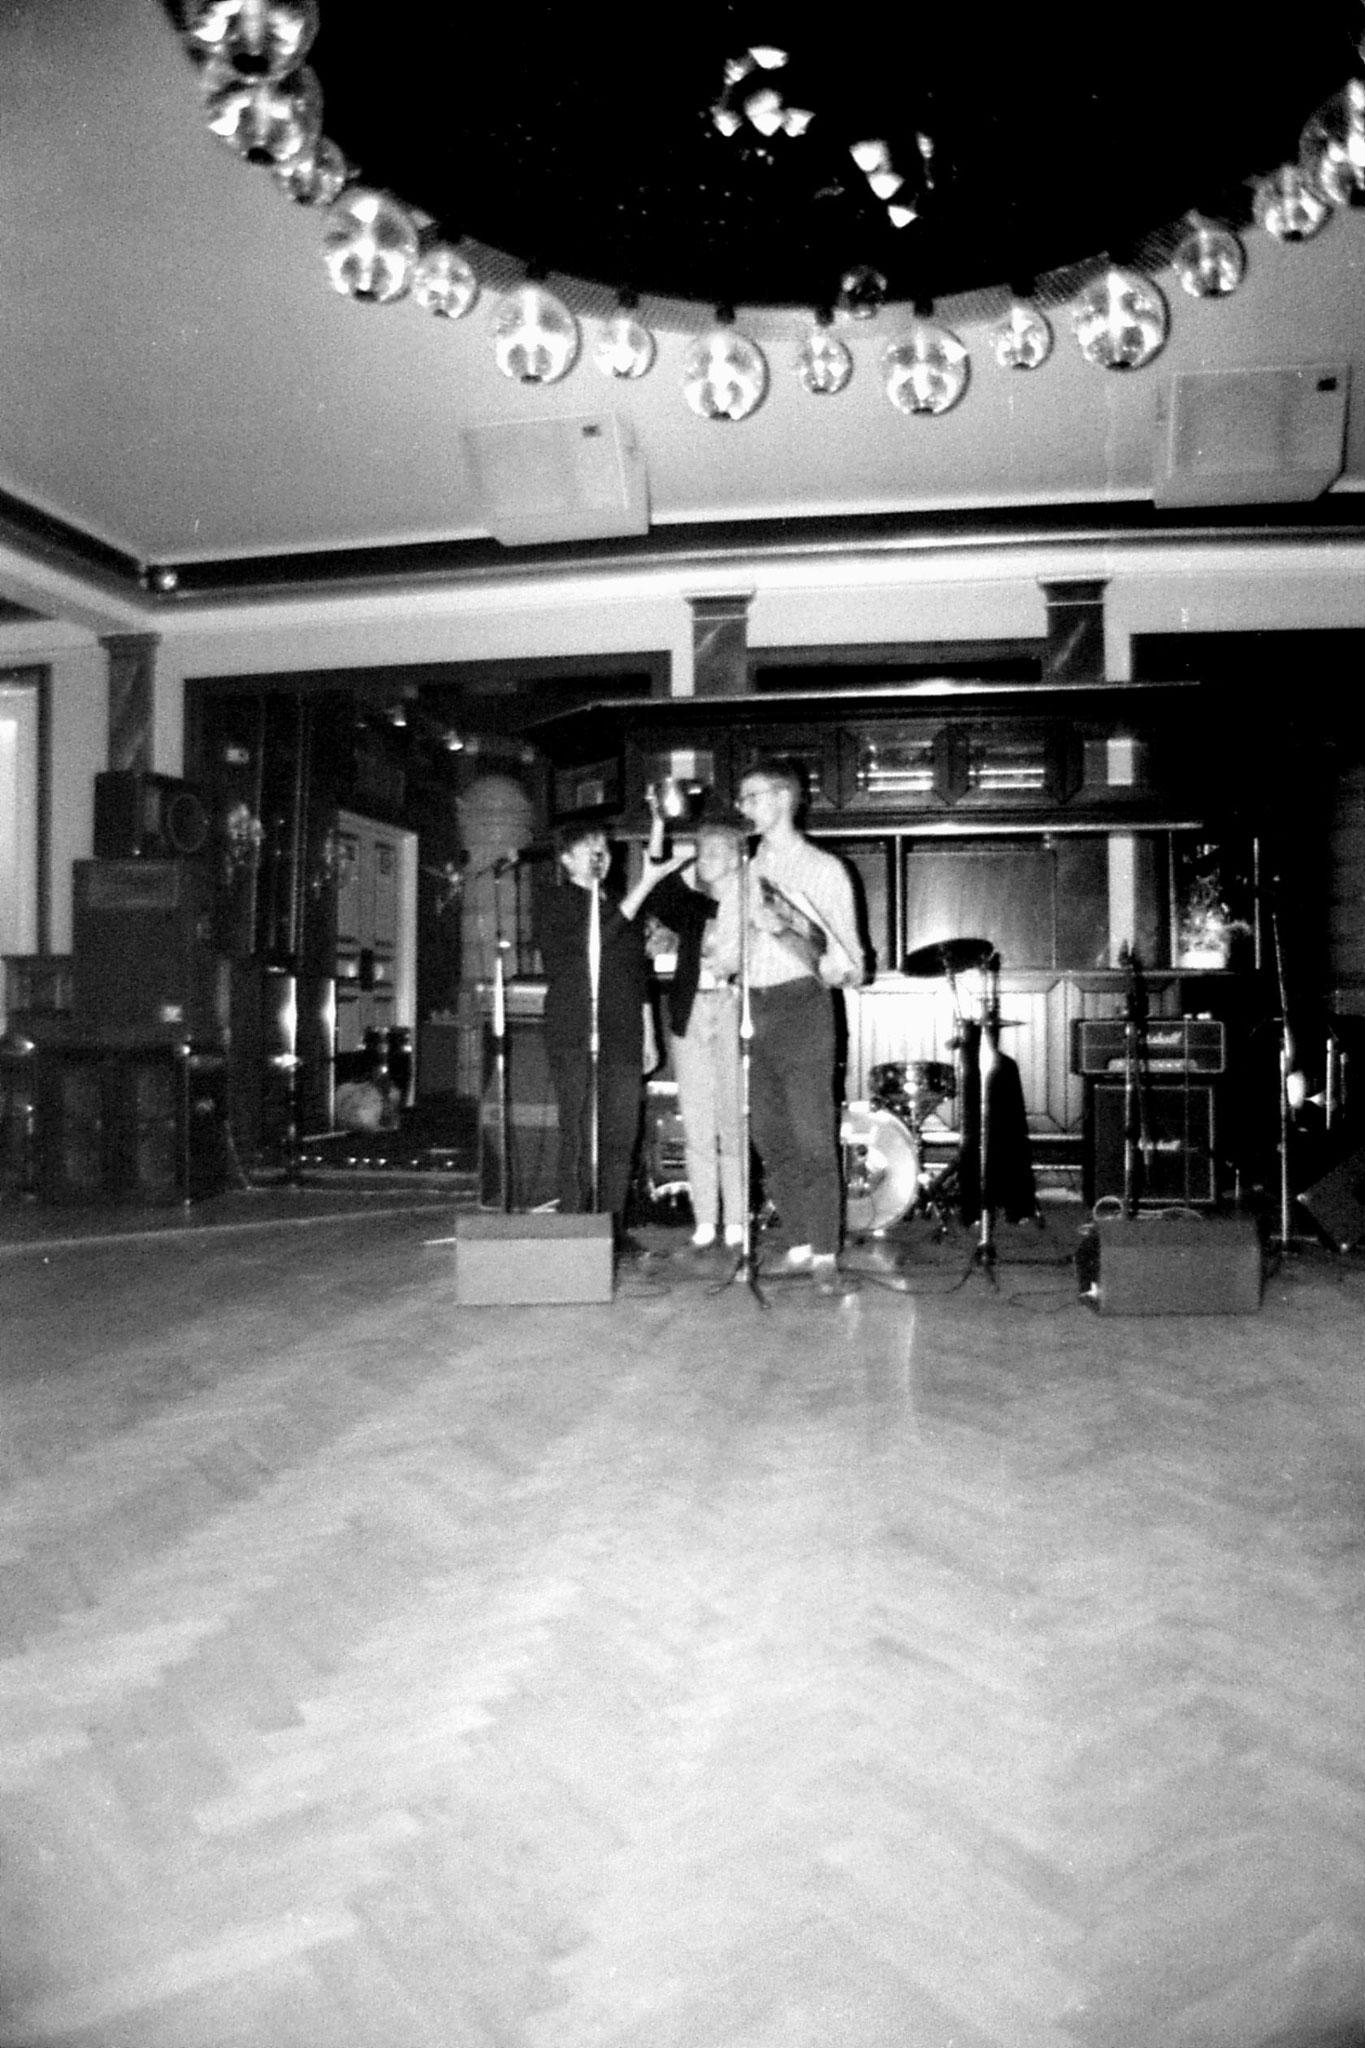 11/10/1988: 2: Ainomaija picking lottery tickets